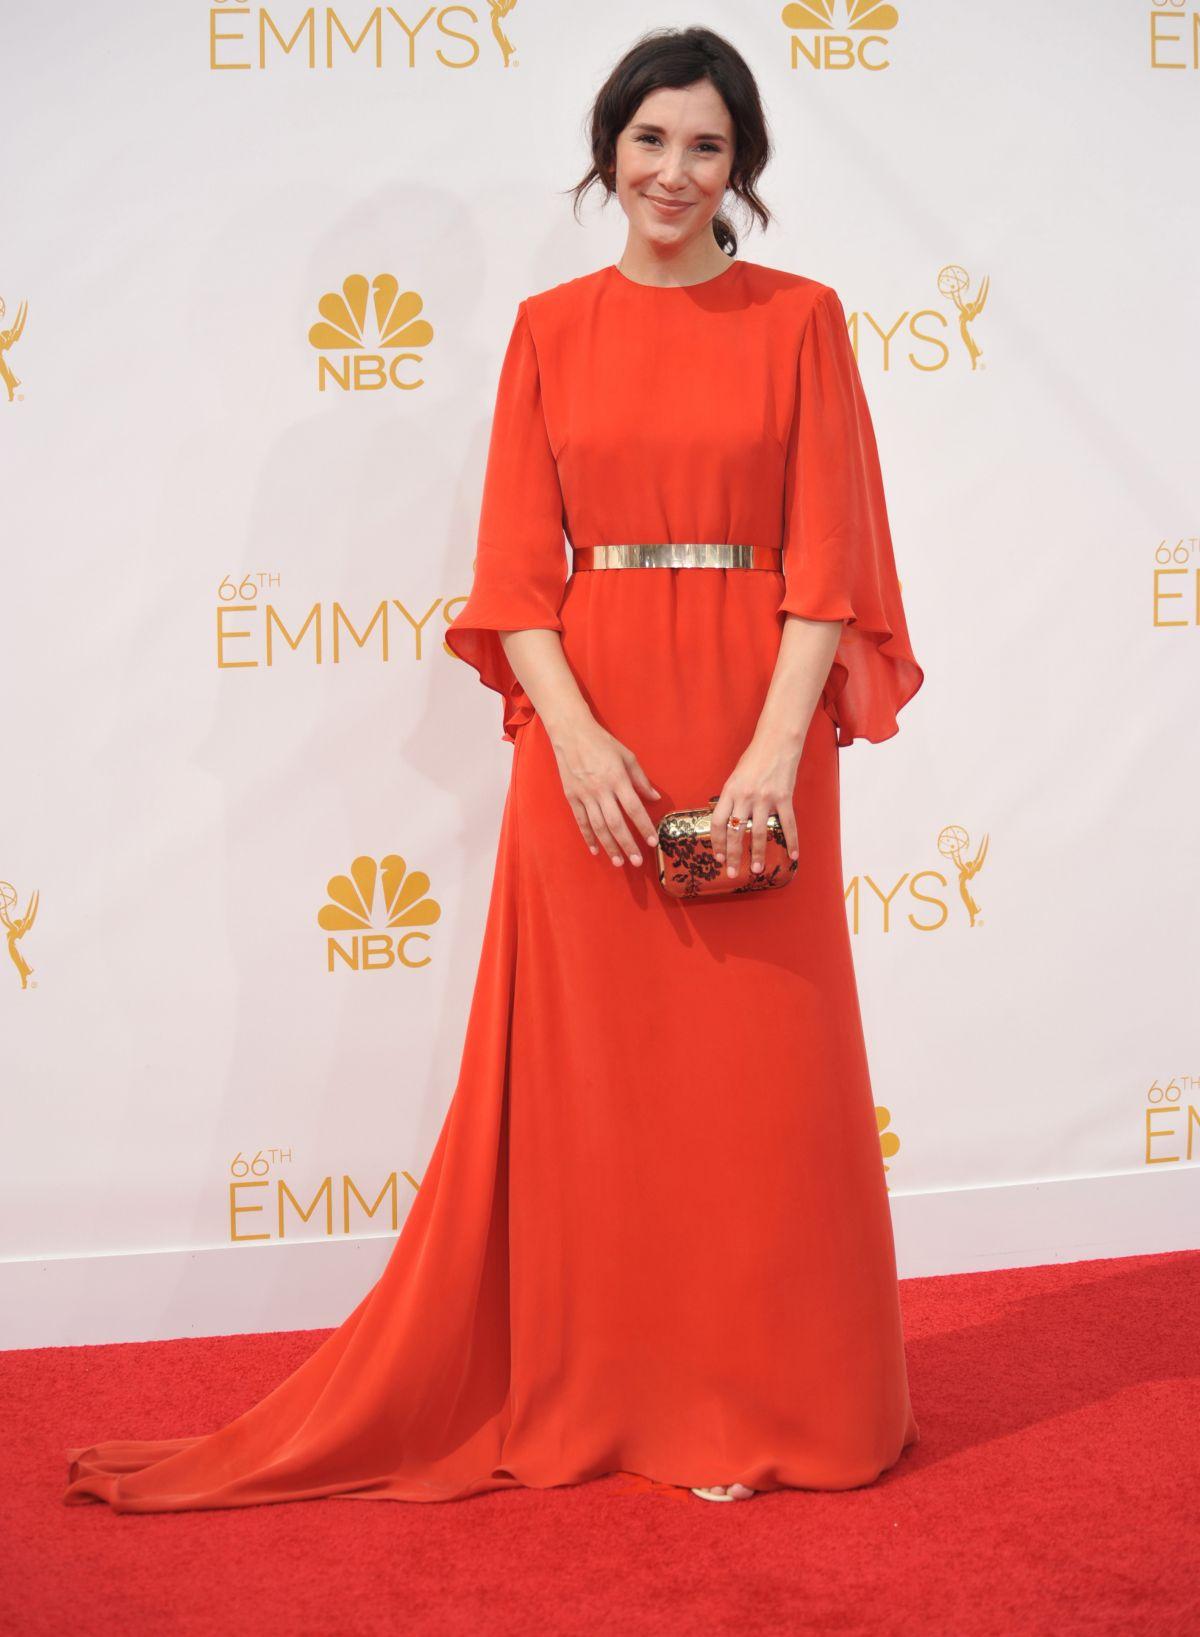 SIBEL KEKILLI at 2014 Emmy Awards